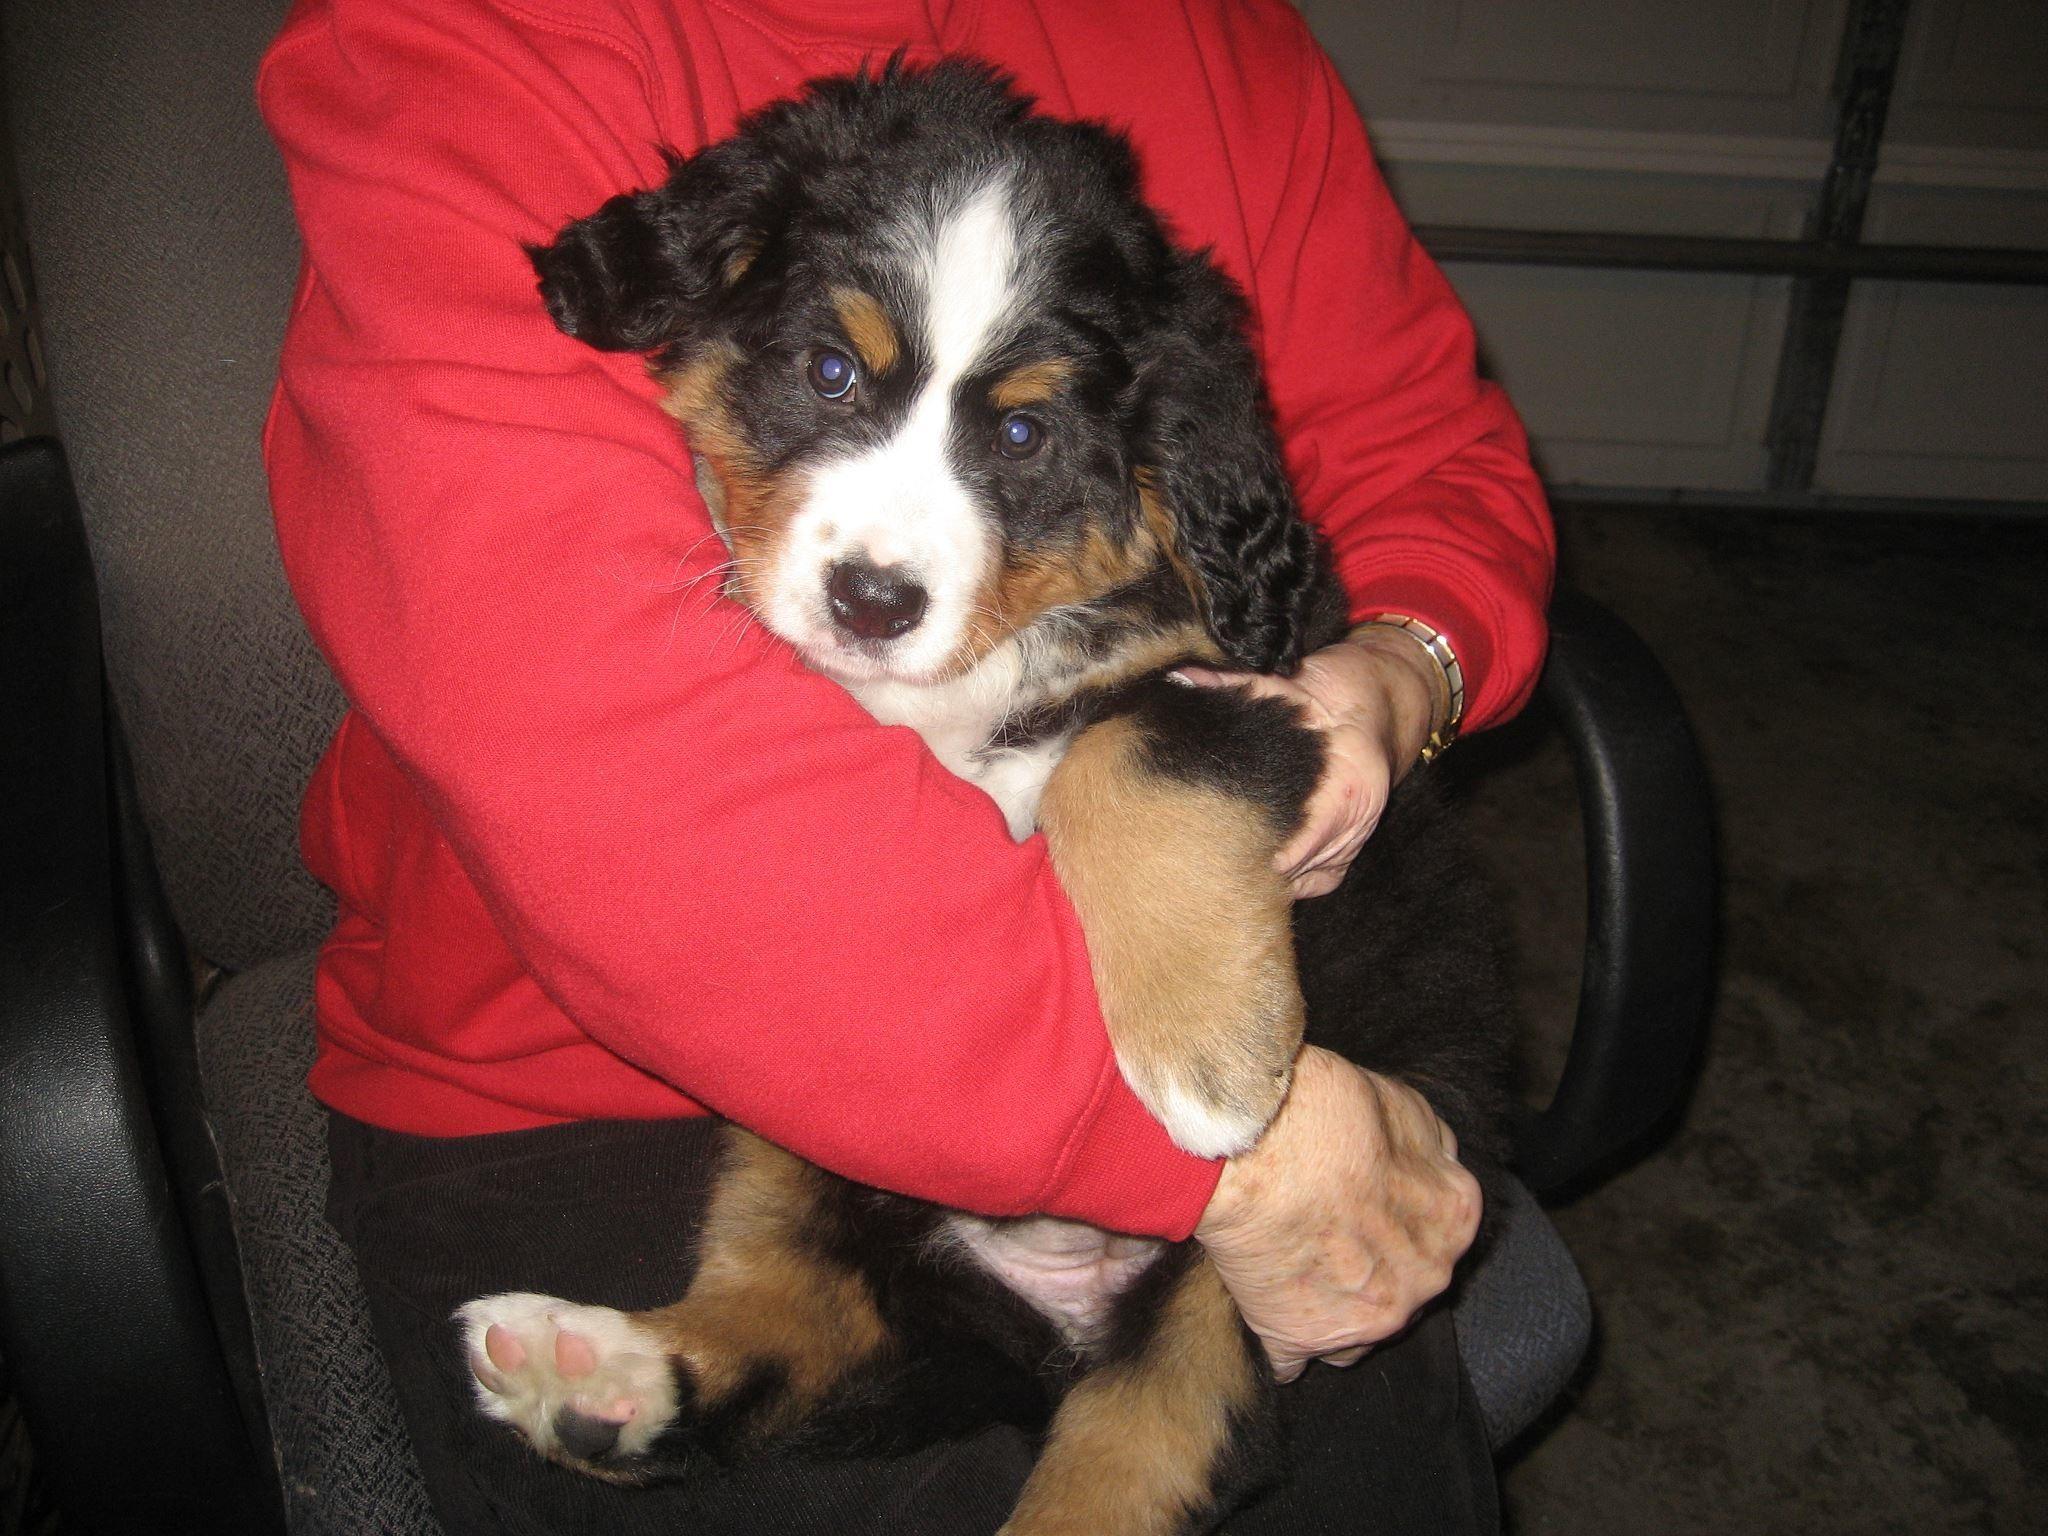 My Bernese mountain dog Mattie